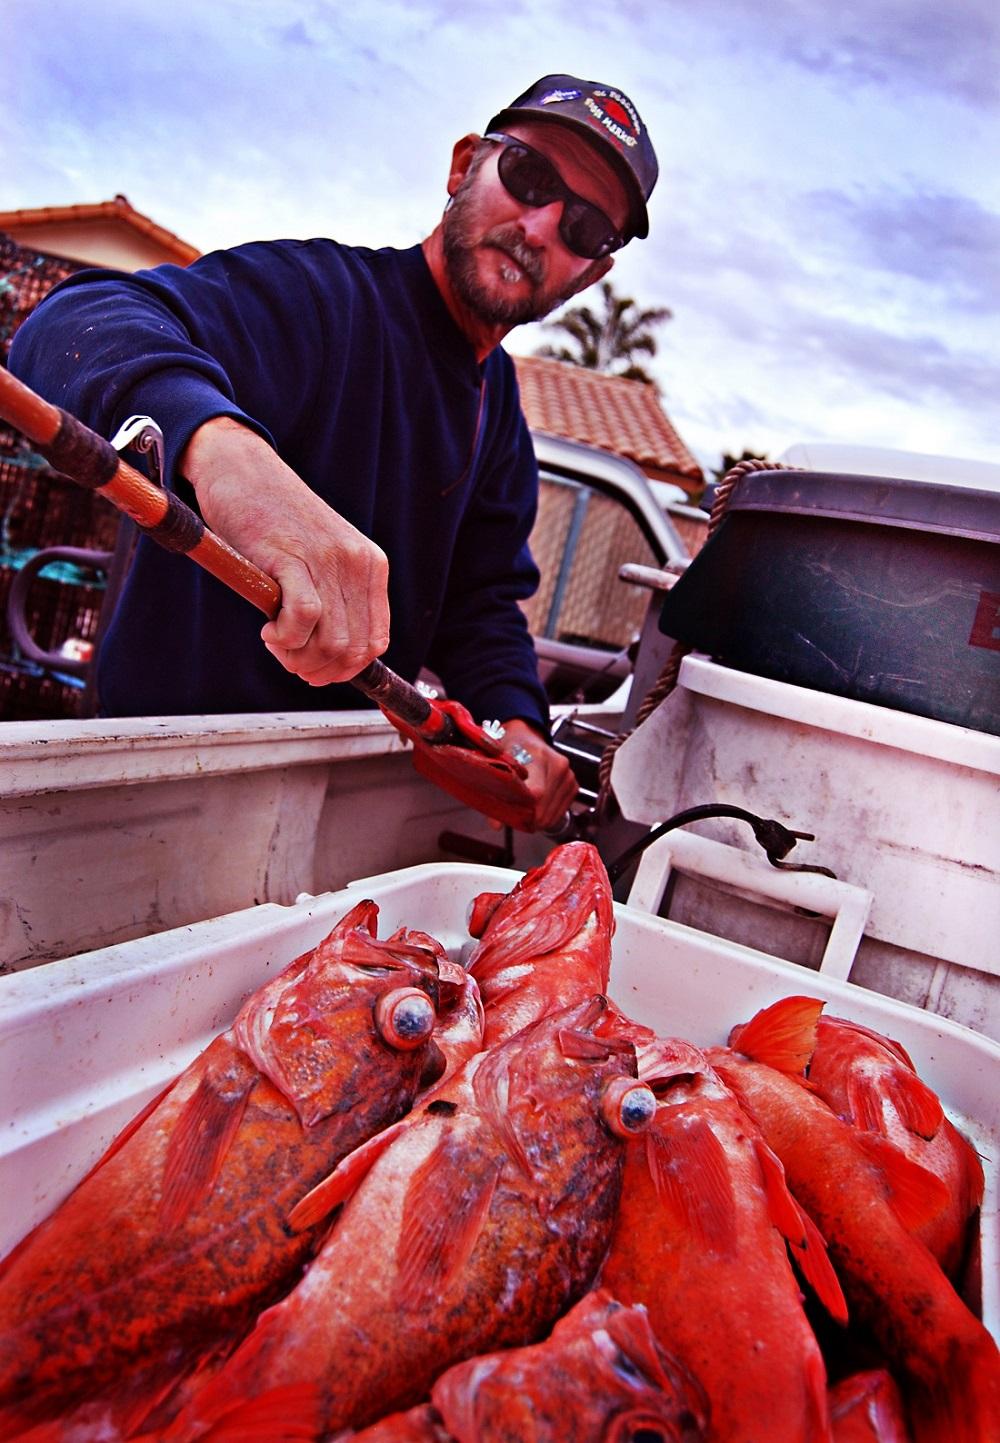 red rockfish, vermilion rockfish, Wild West, local seafood, San Diego, Tuna Harbor Dockside Market